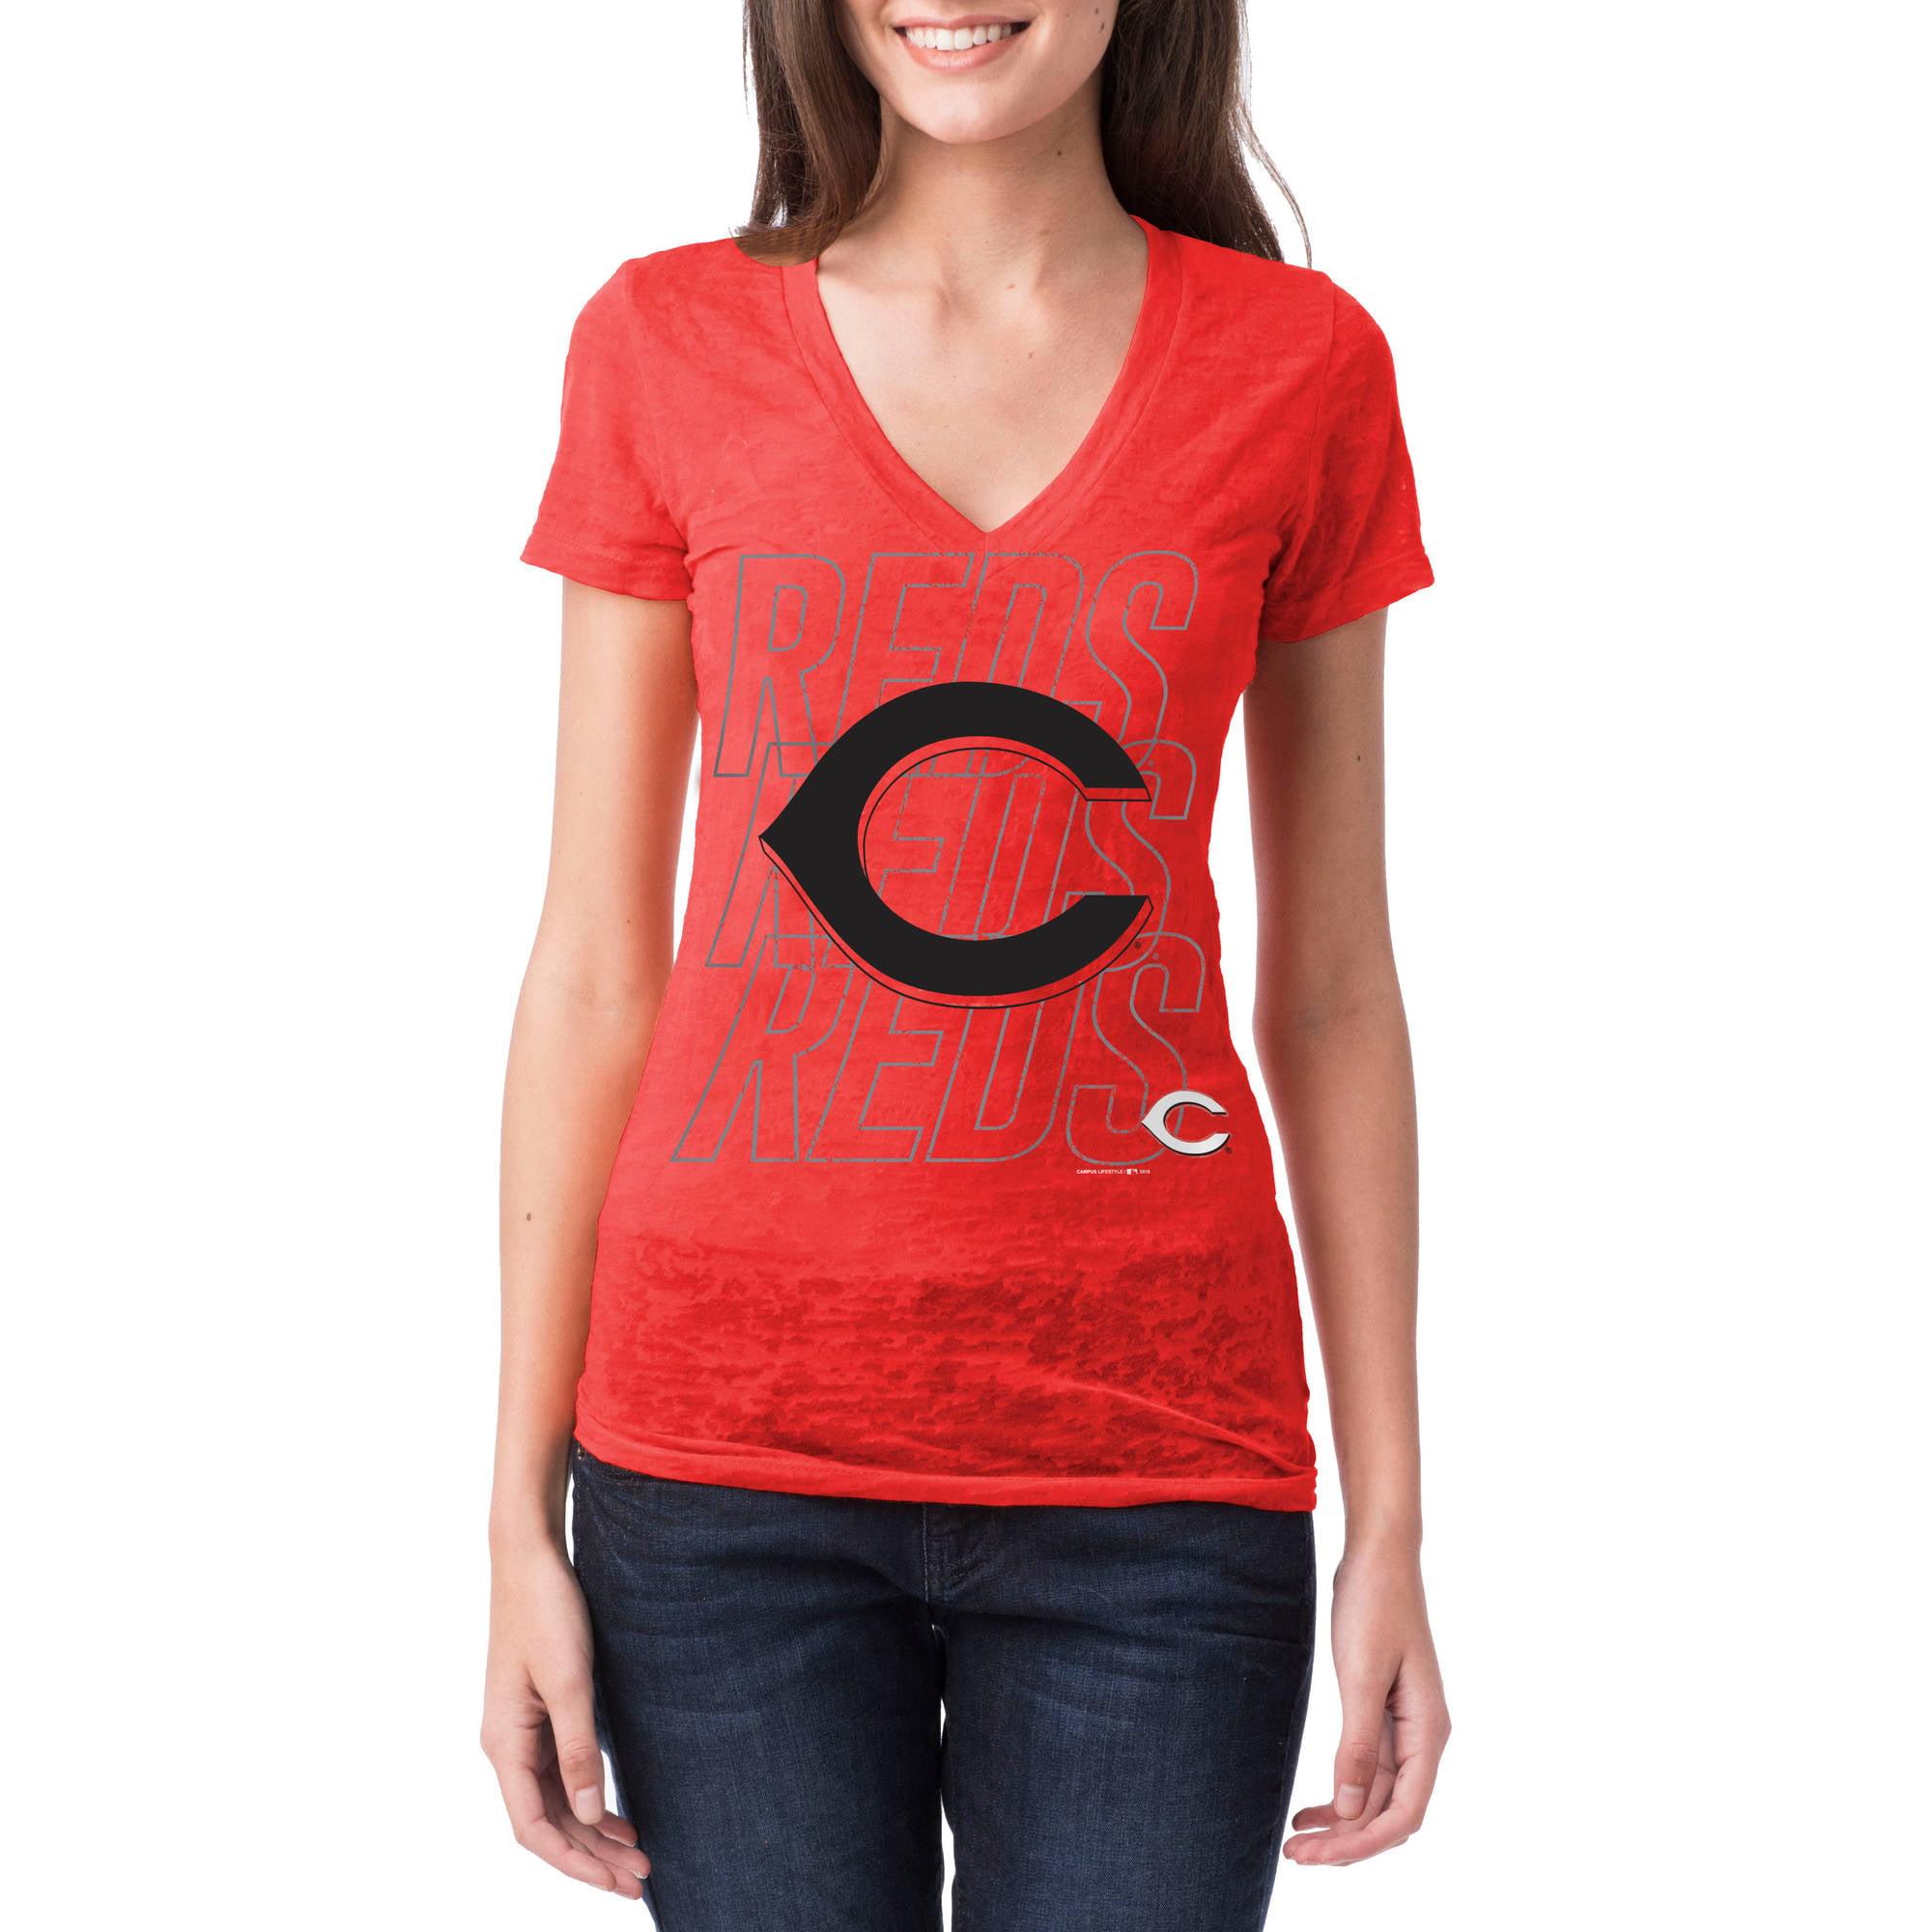 Cincinnati Reds Womens Short Sleeve Burnout Graphic Tee